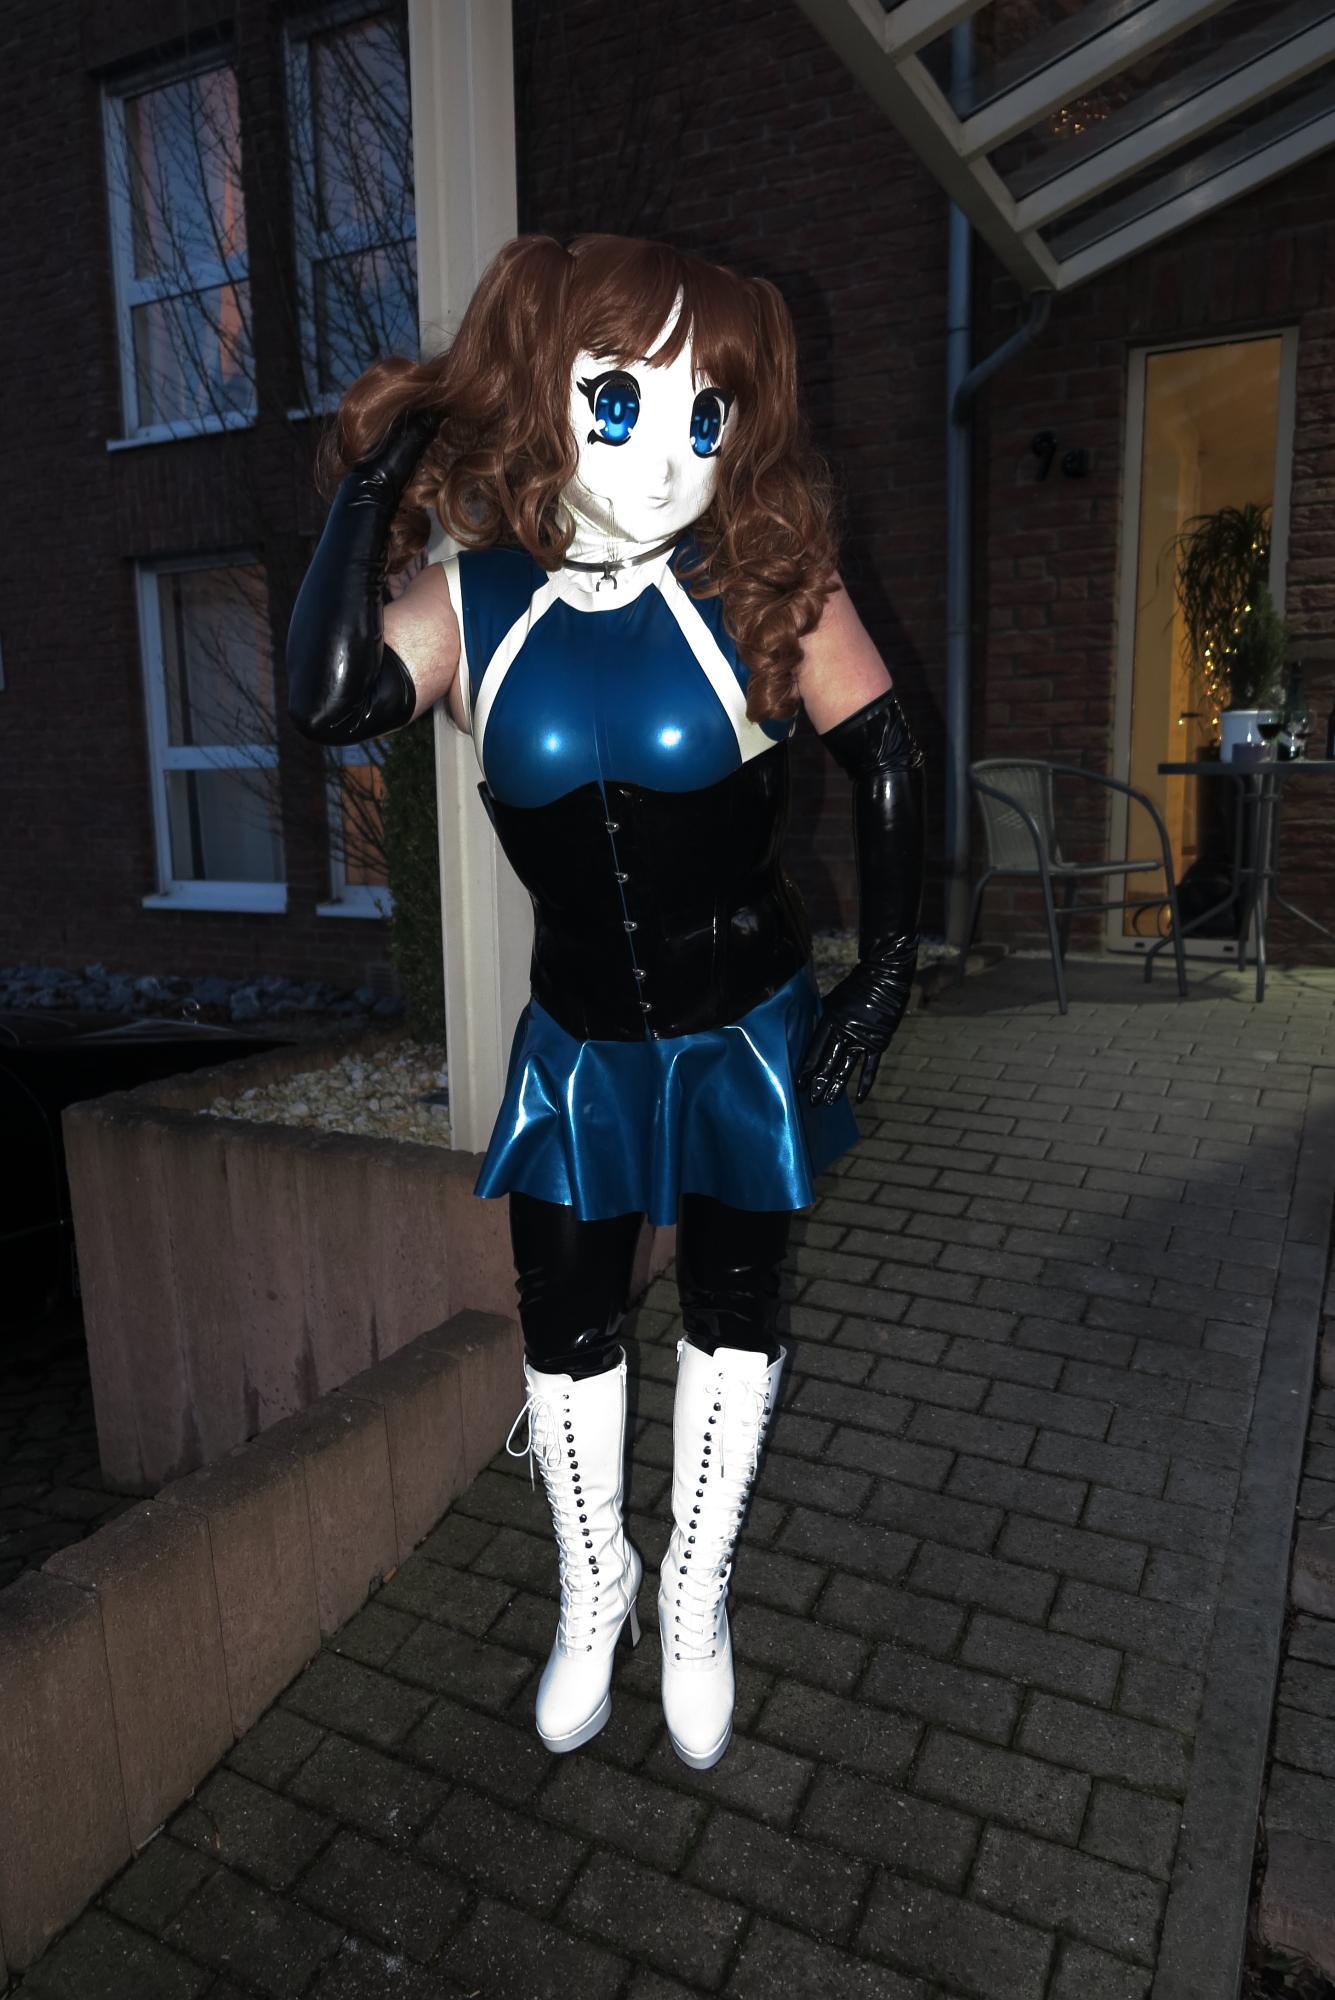 Asuka Akira Kig Outdoor